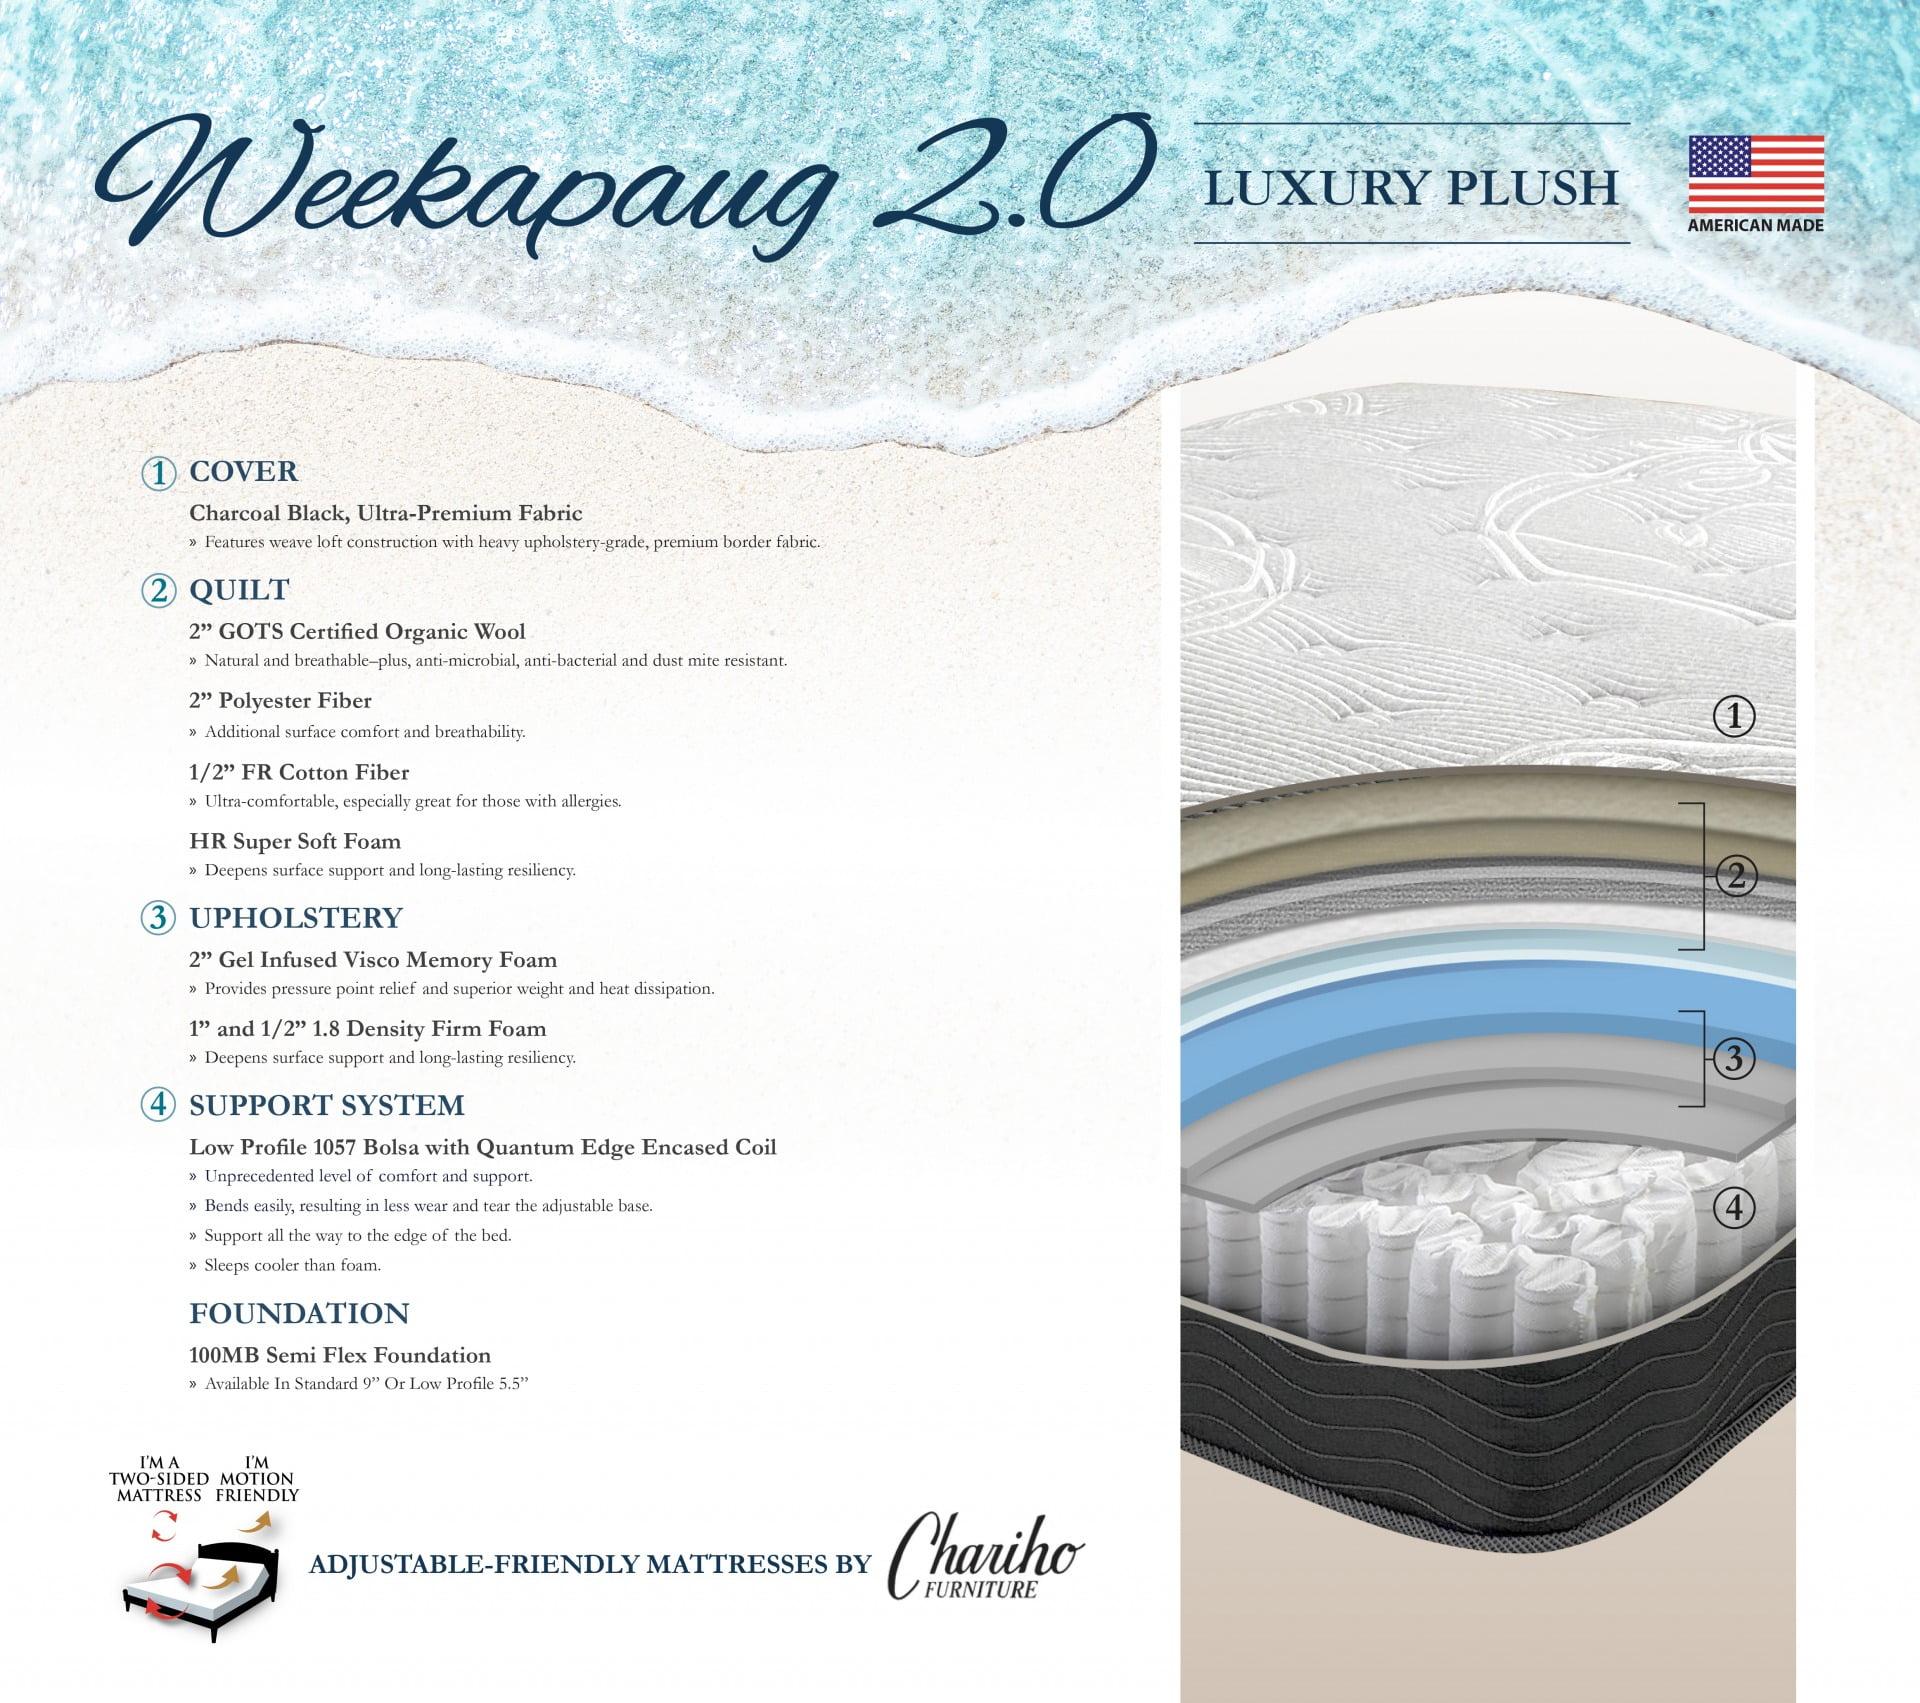 Chariho Furniture AJ Weekapaug 2.0 Luxury Plush Spec Card